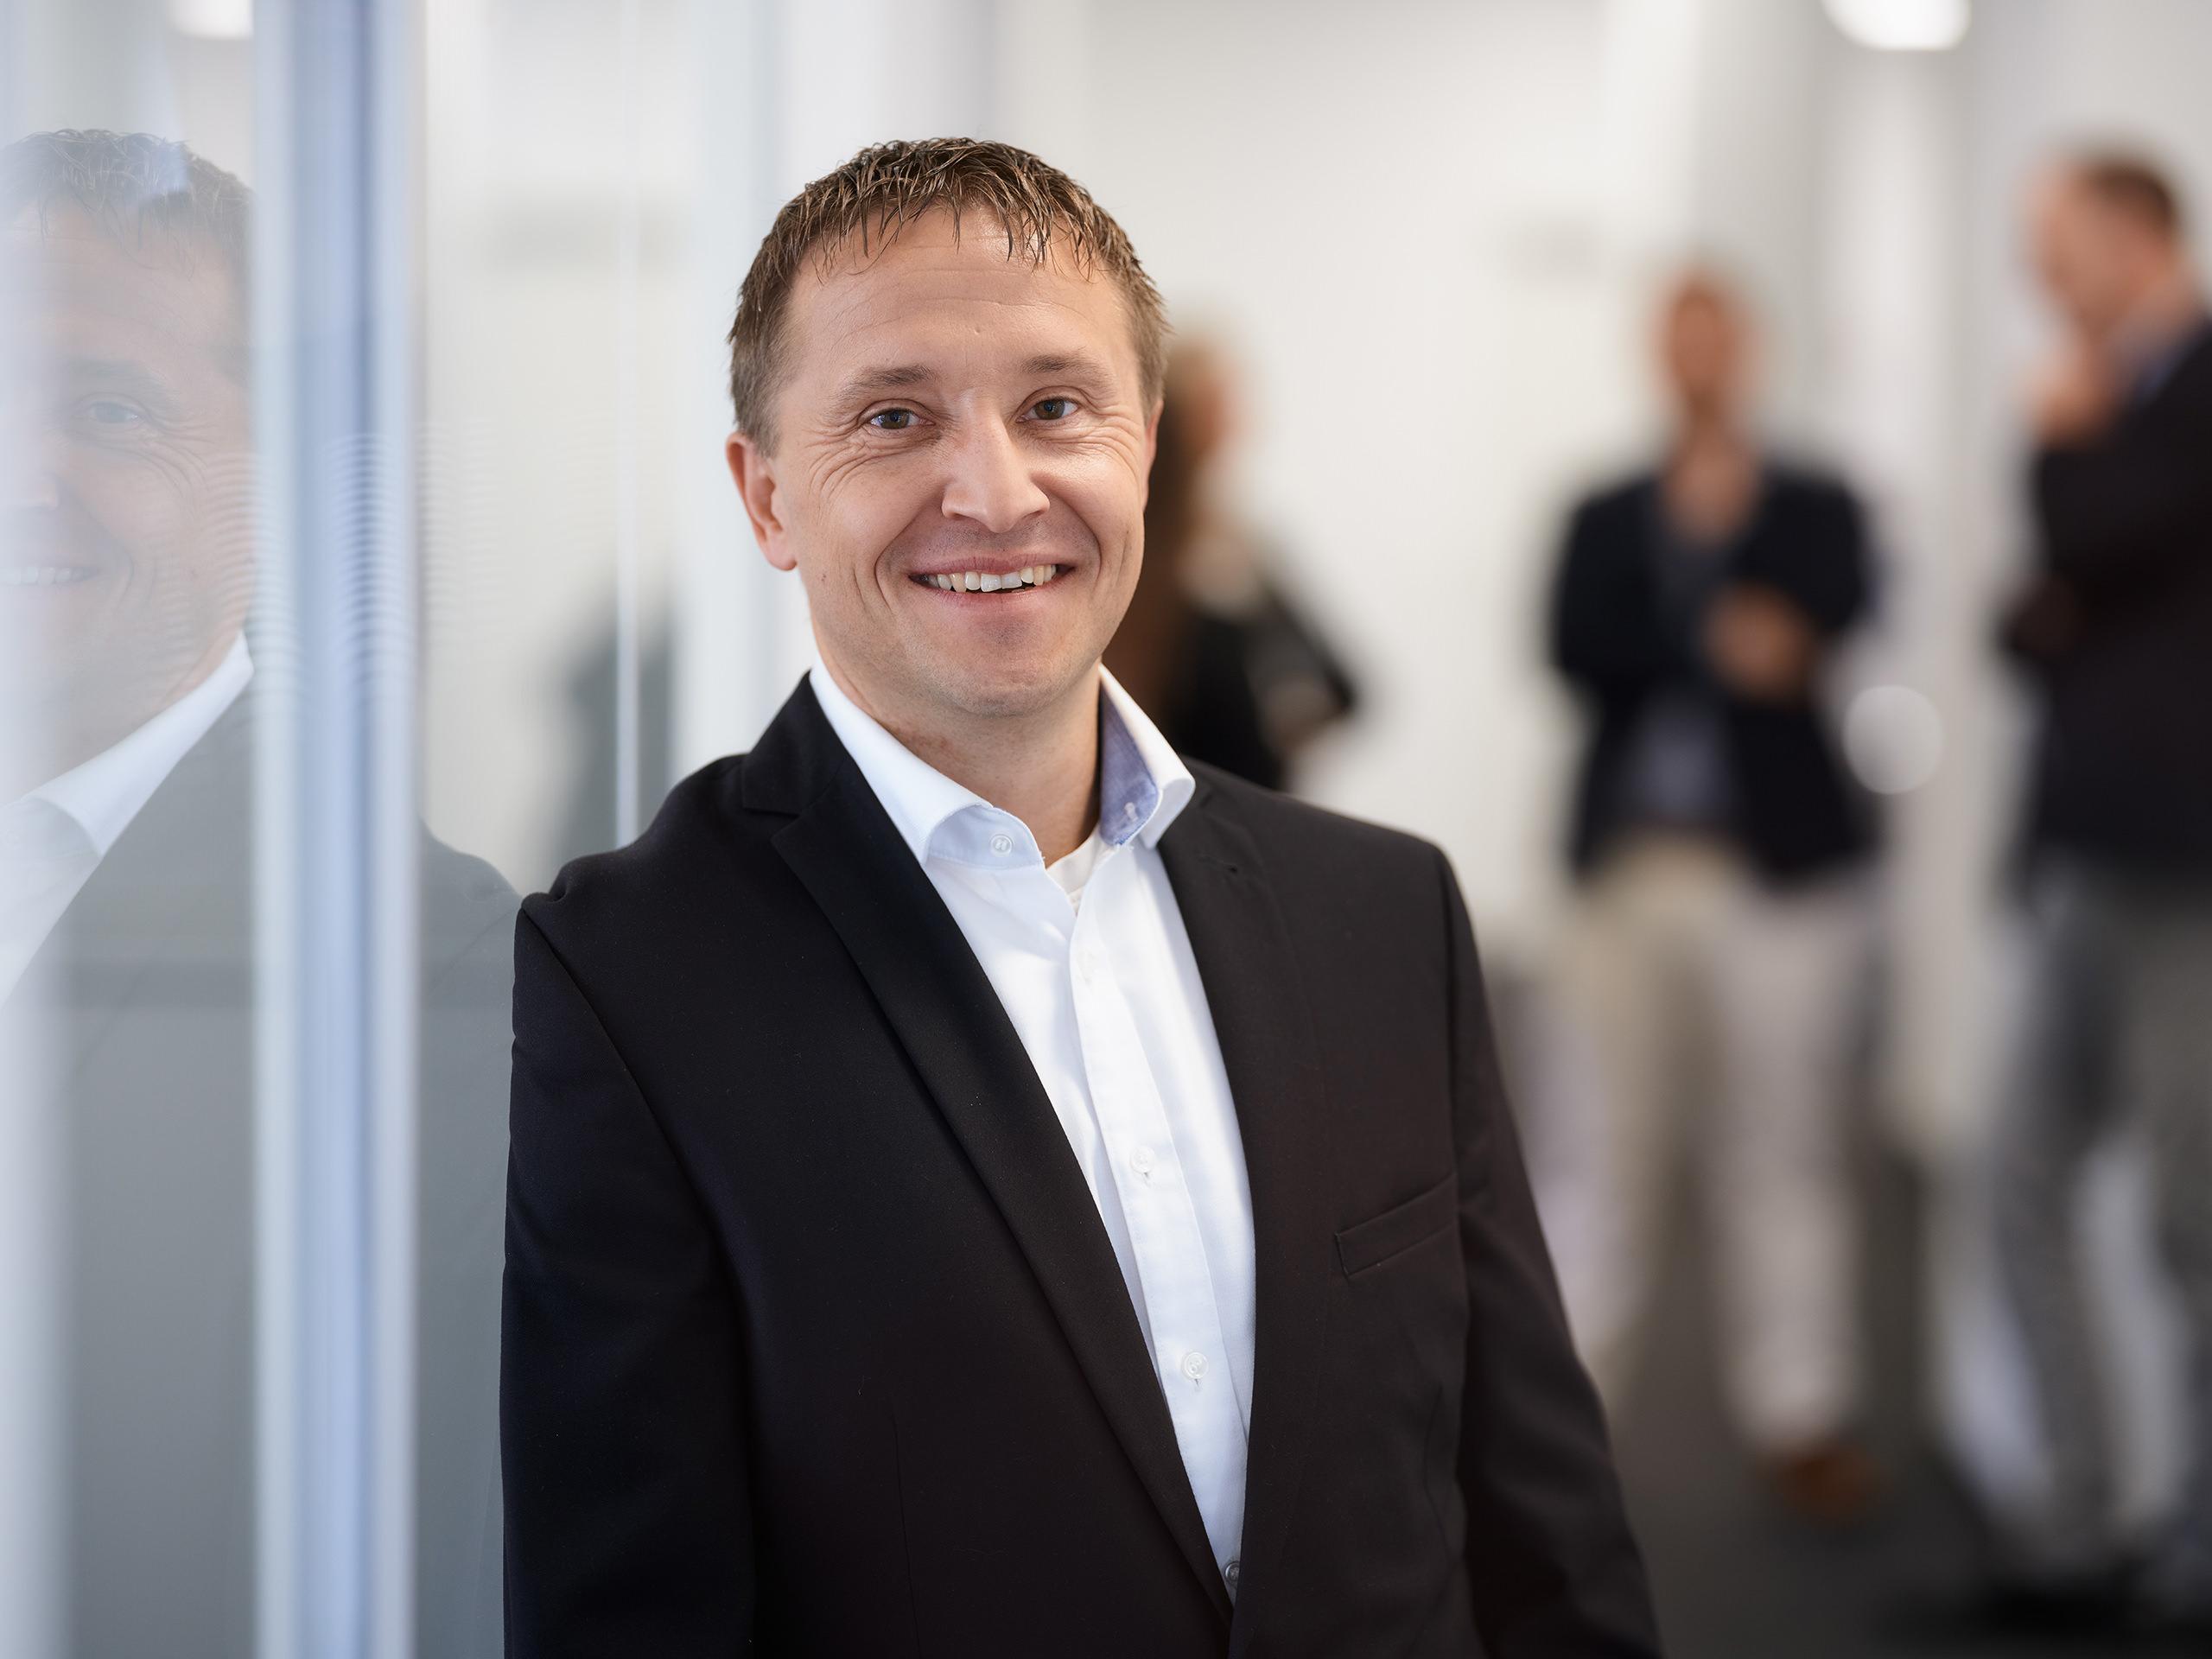 Matthias Langer, Diplom-Betriebswirt (FH) Steuerberater Partner